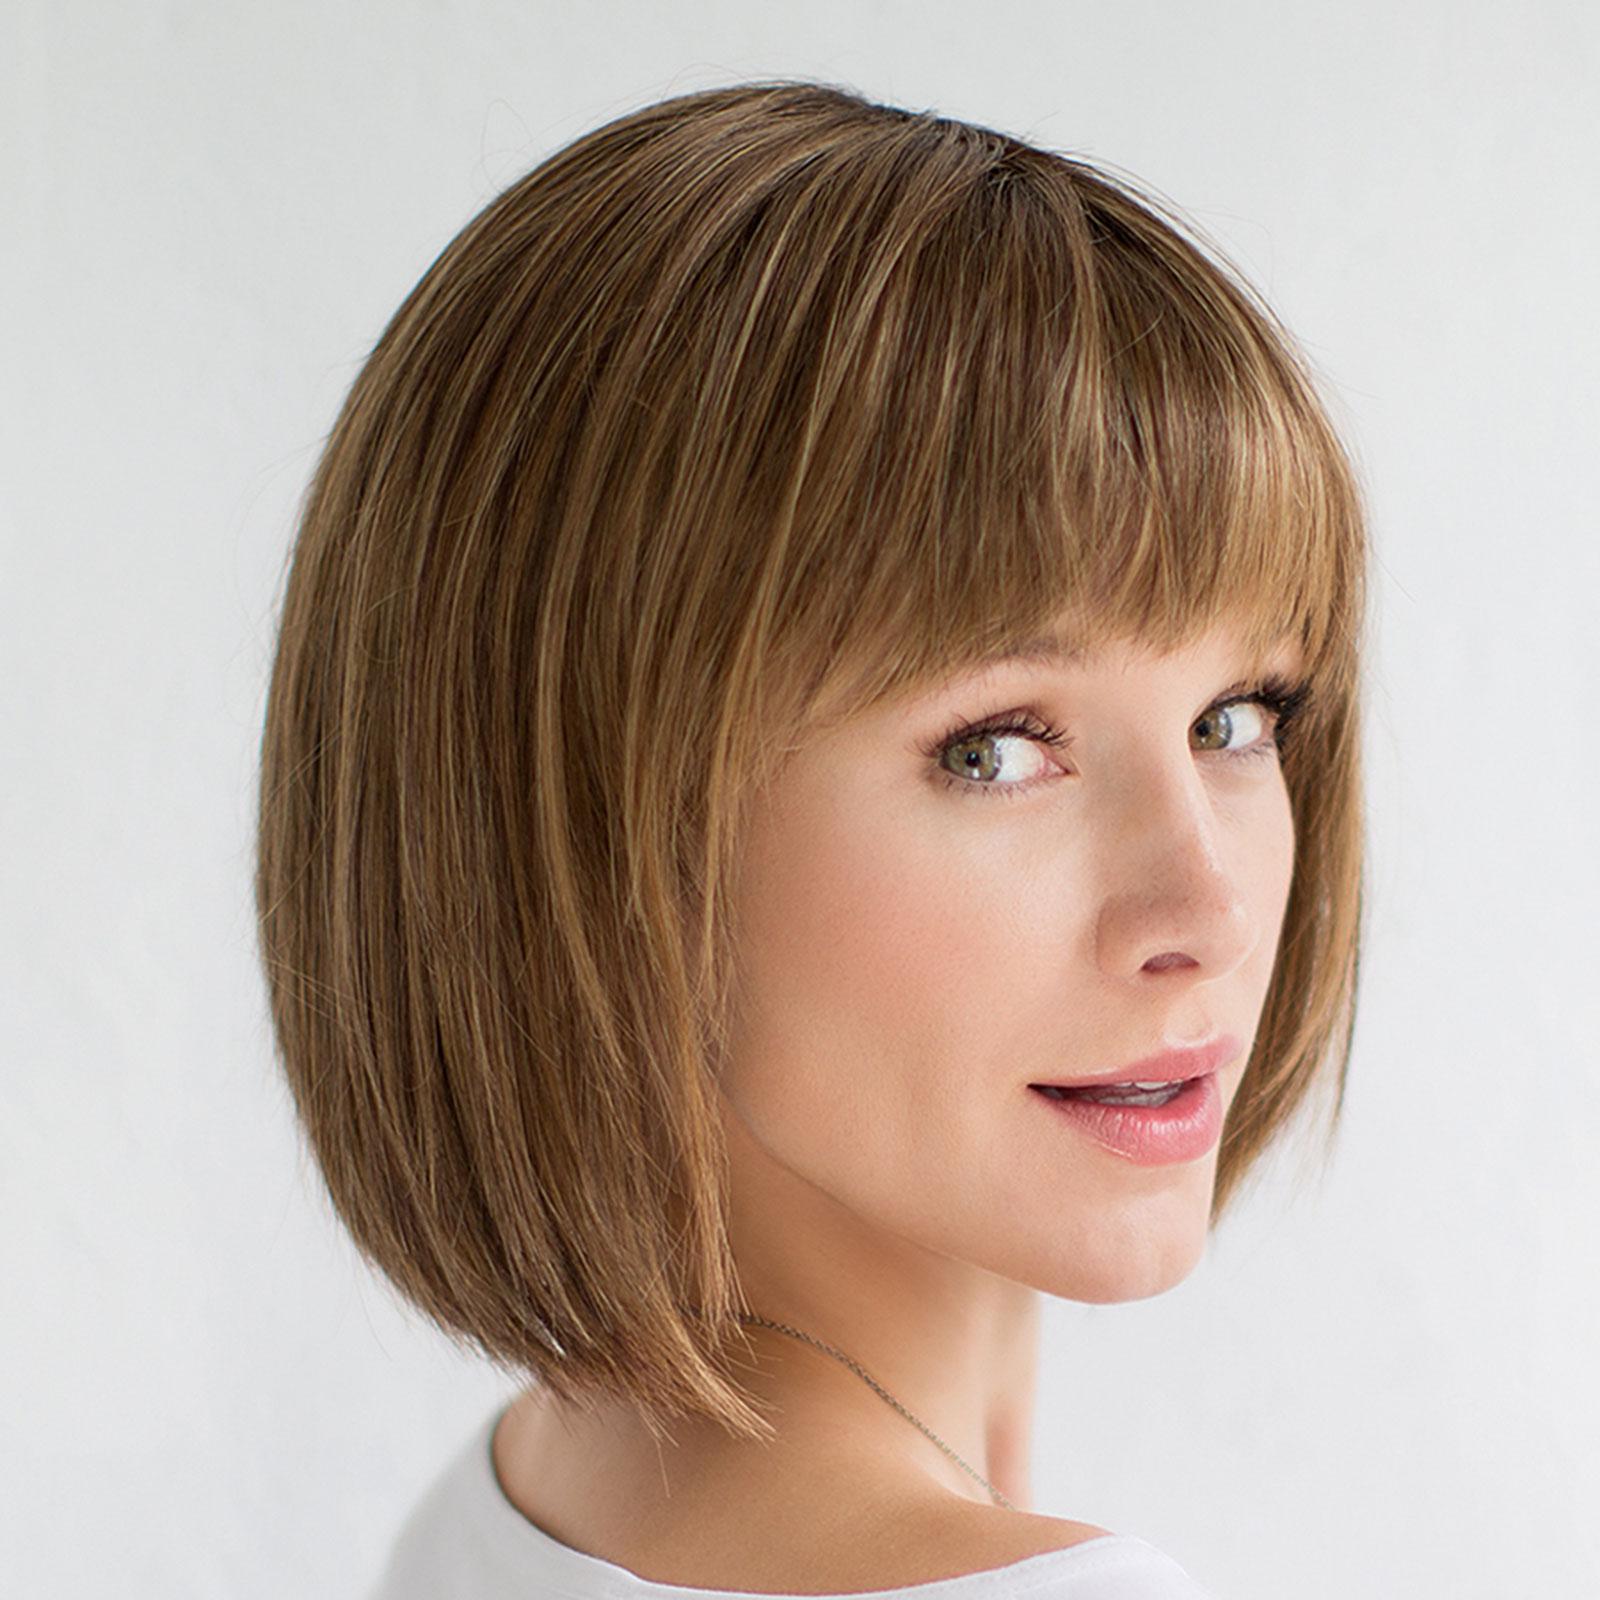 perucci hair piece - change